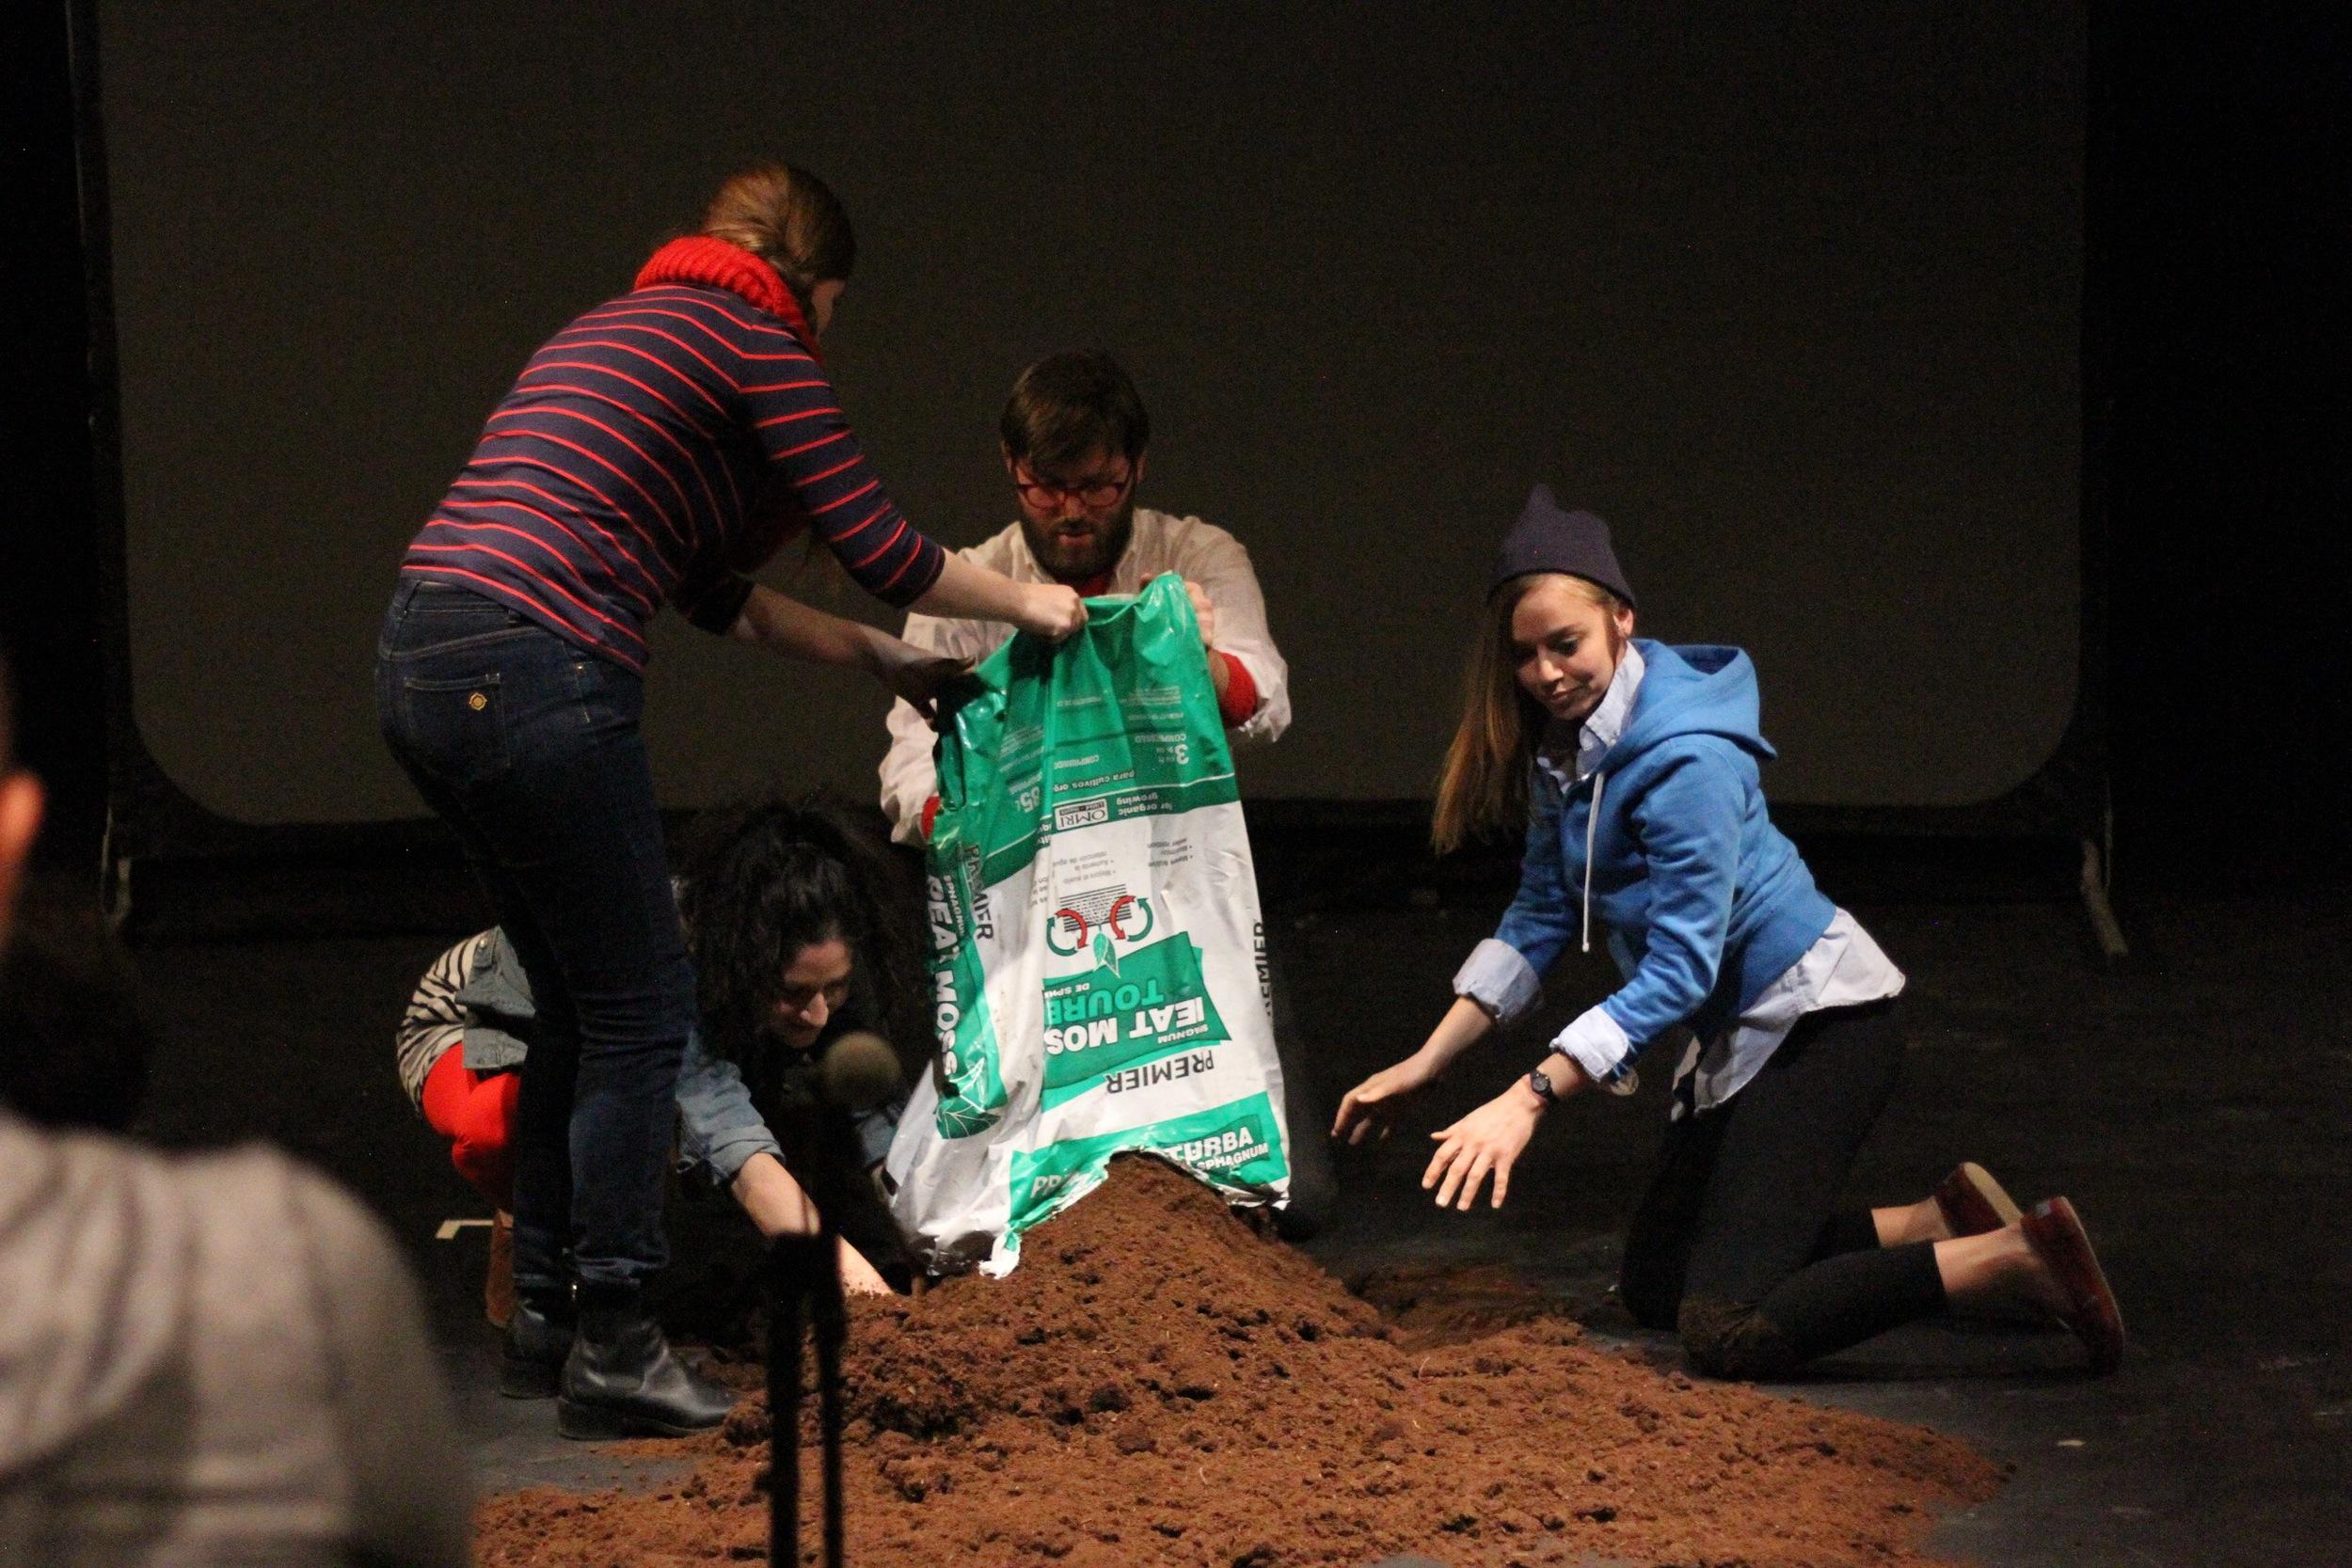 Pictured: Lisa Szolovits, Rebecca Posner, Eric Magnus, and Cara Juan. Photo by Helen Richardson.